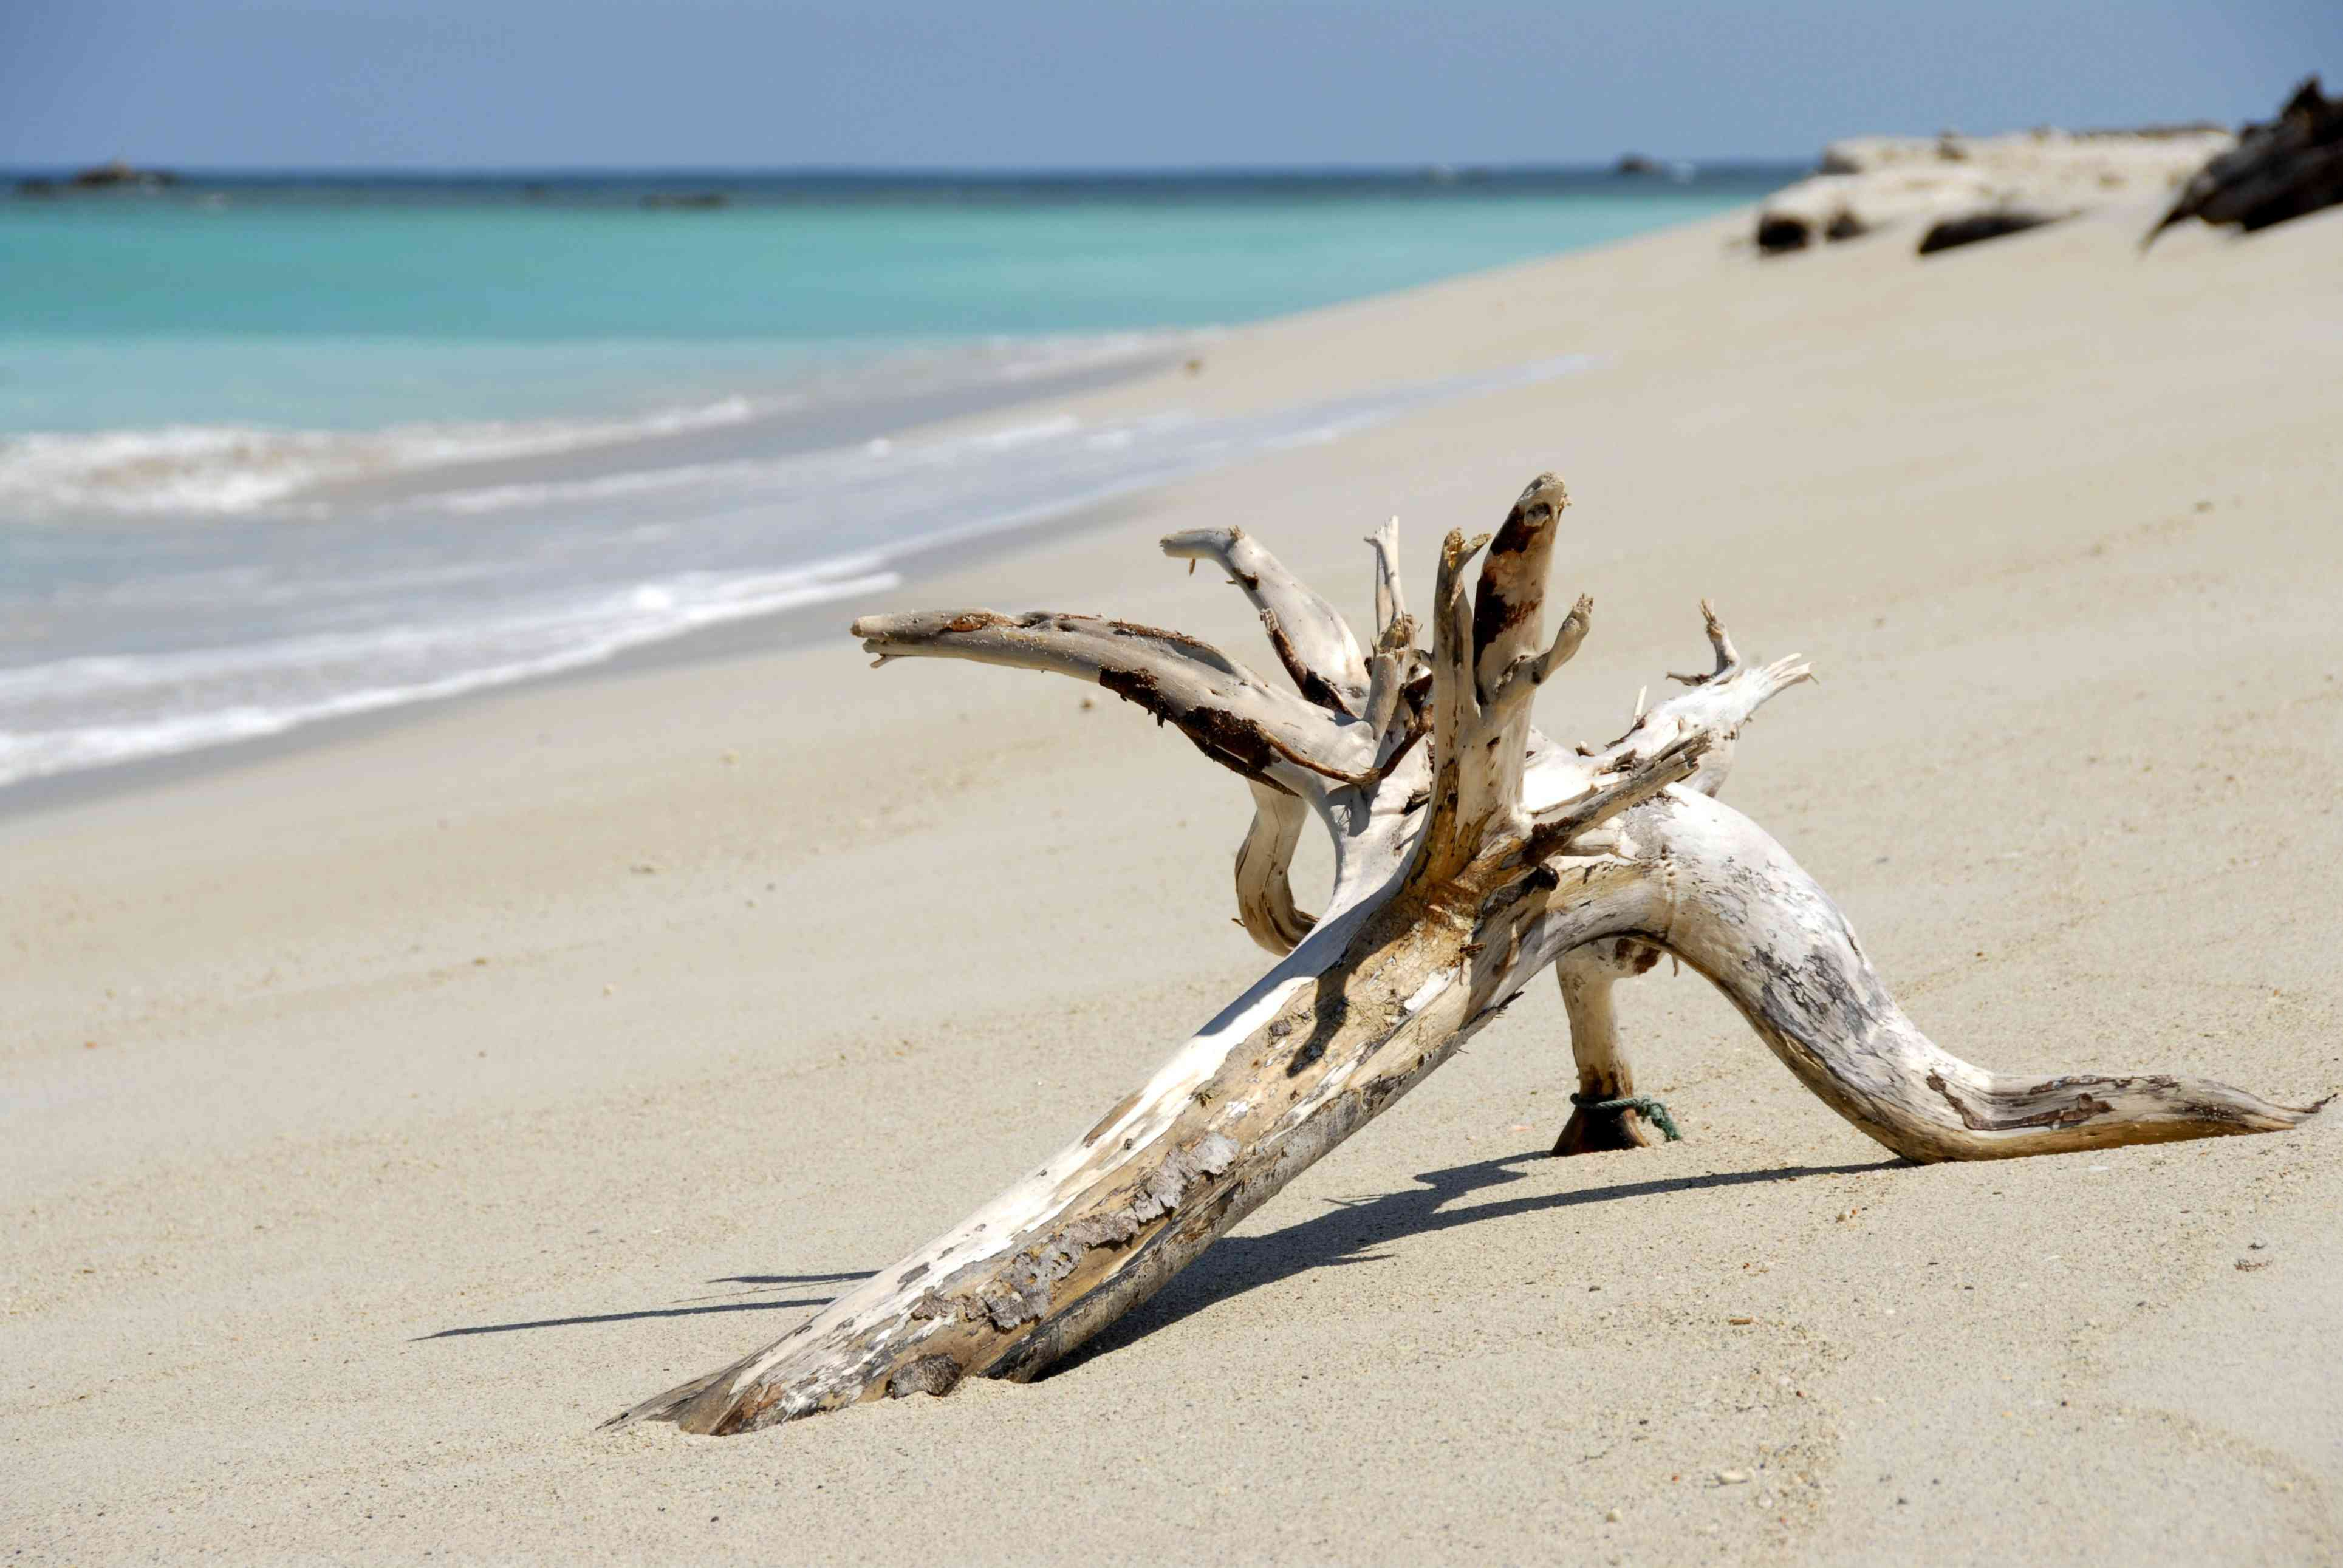 Driftwood on the beach at Tiga Island, Borneo